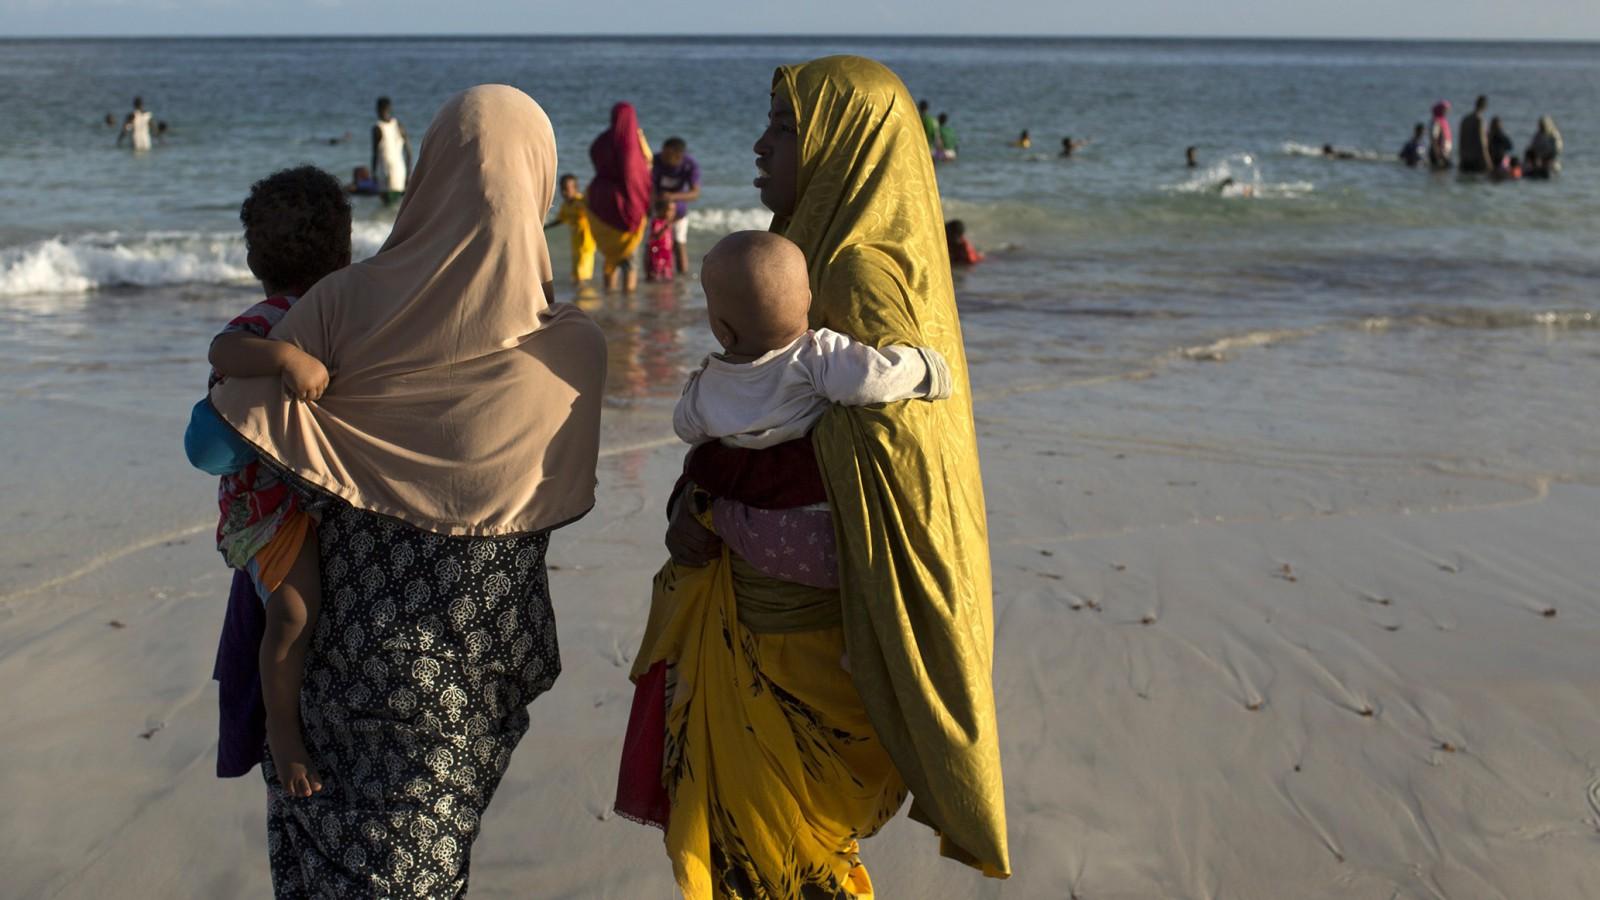 Women carry children as they chat on Lido beach in Mogadishu November 13, 2013. REUTERS/Siegfried Modola (SOMALIA - Tags: SOCIETY TRAVEL) - RTX15C07